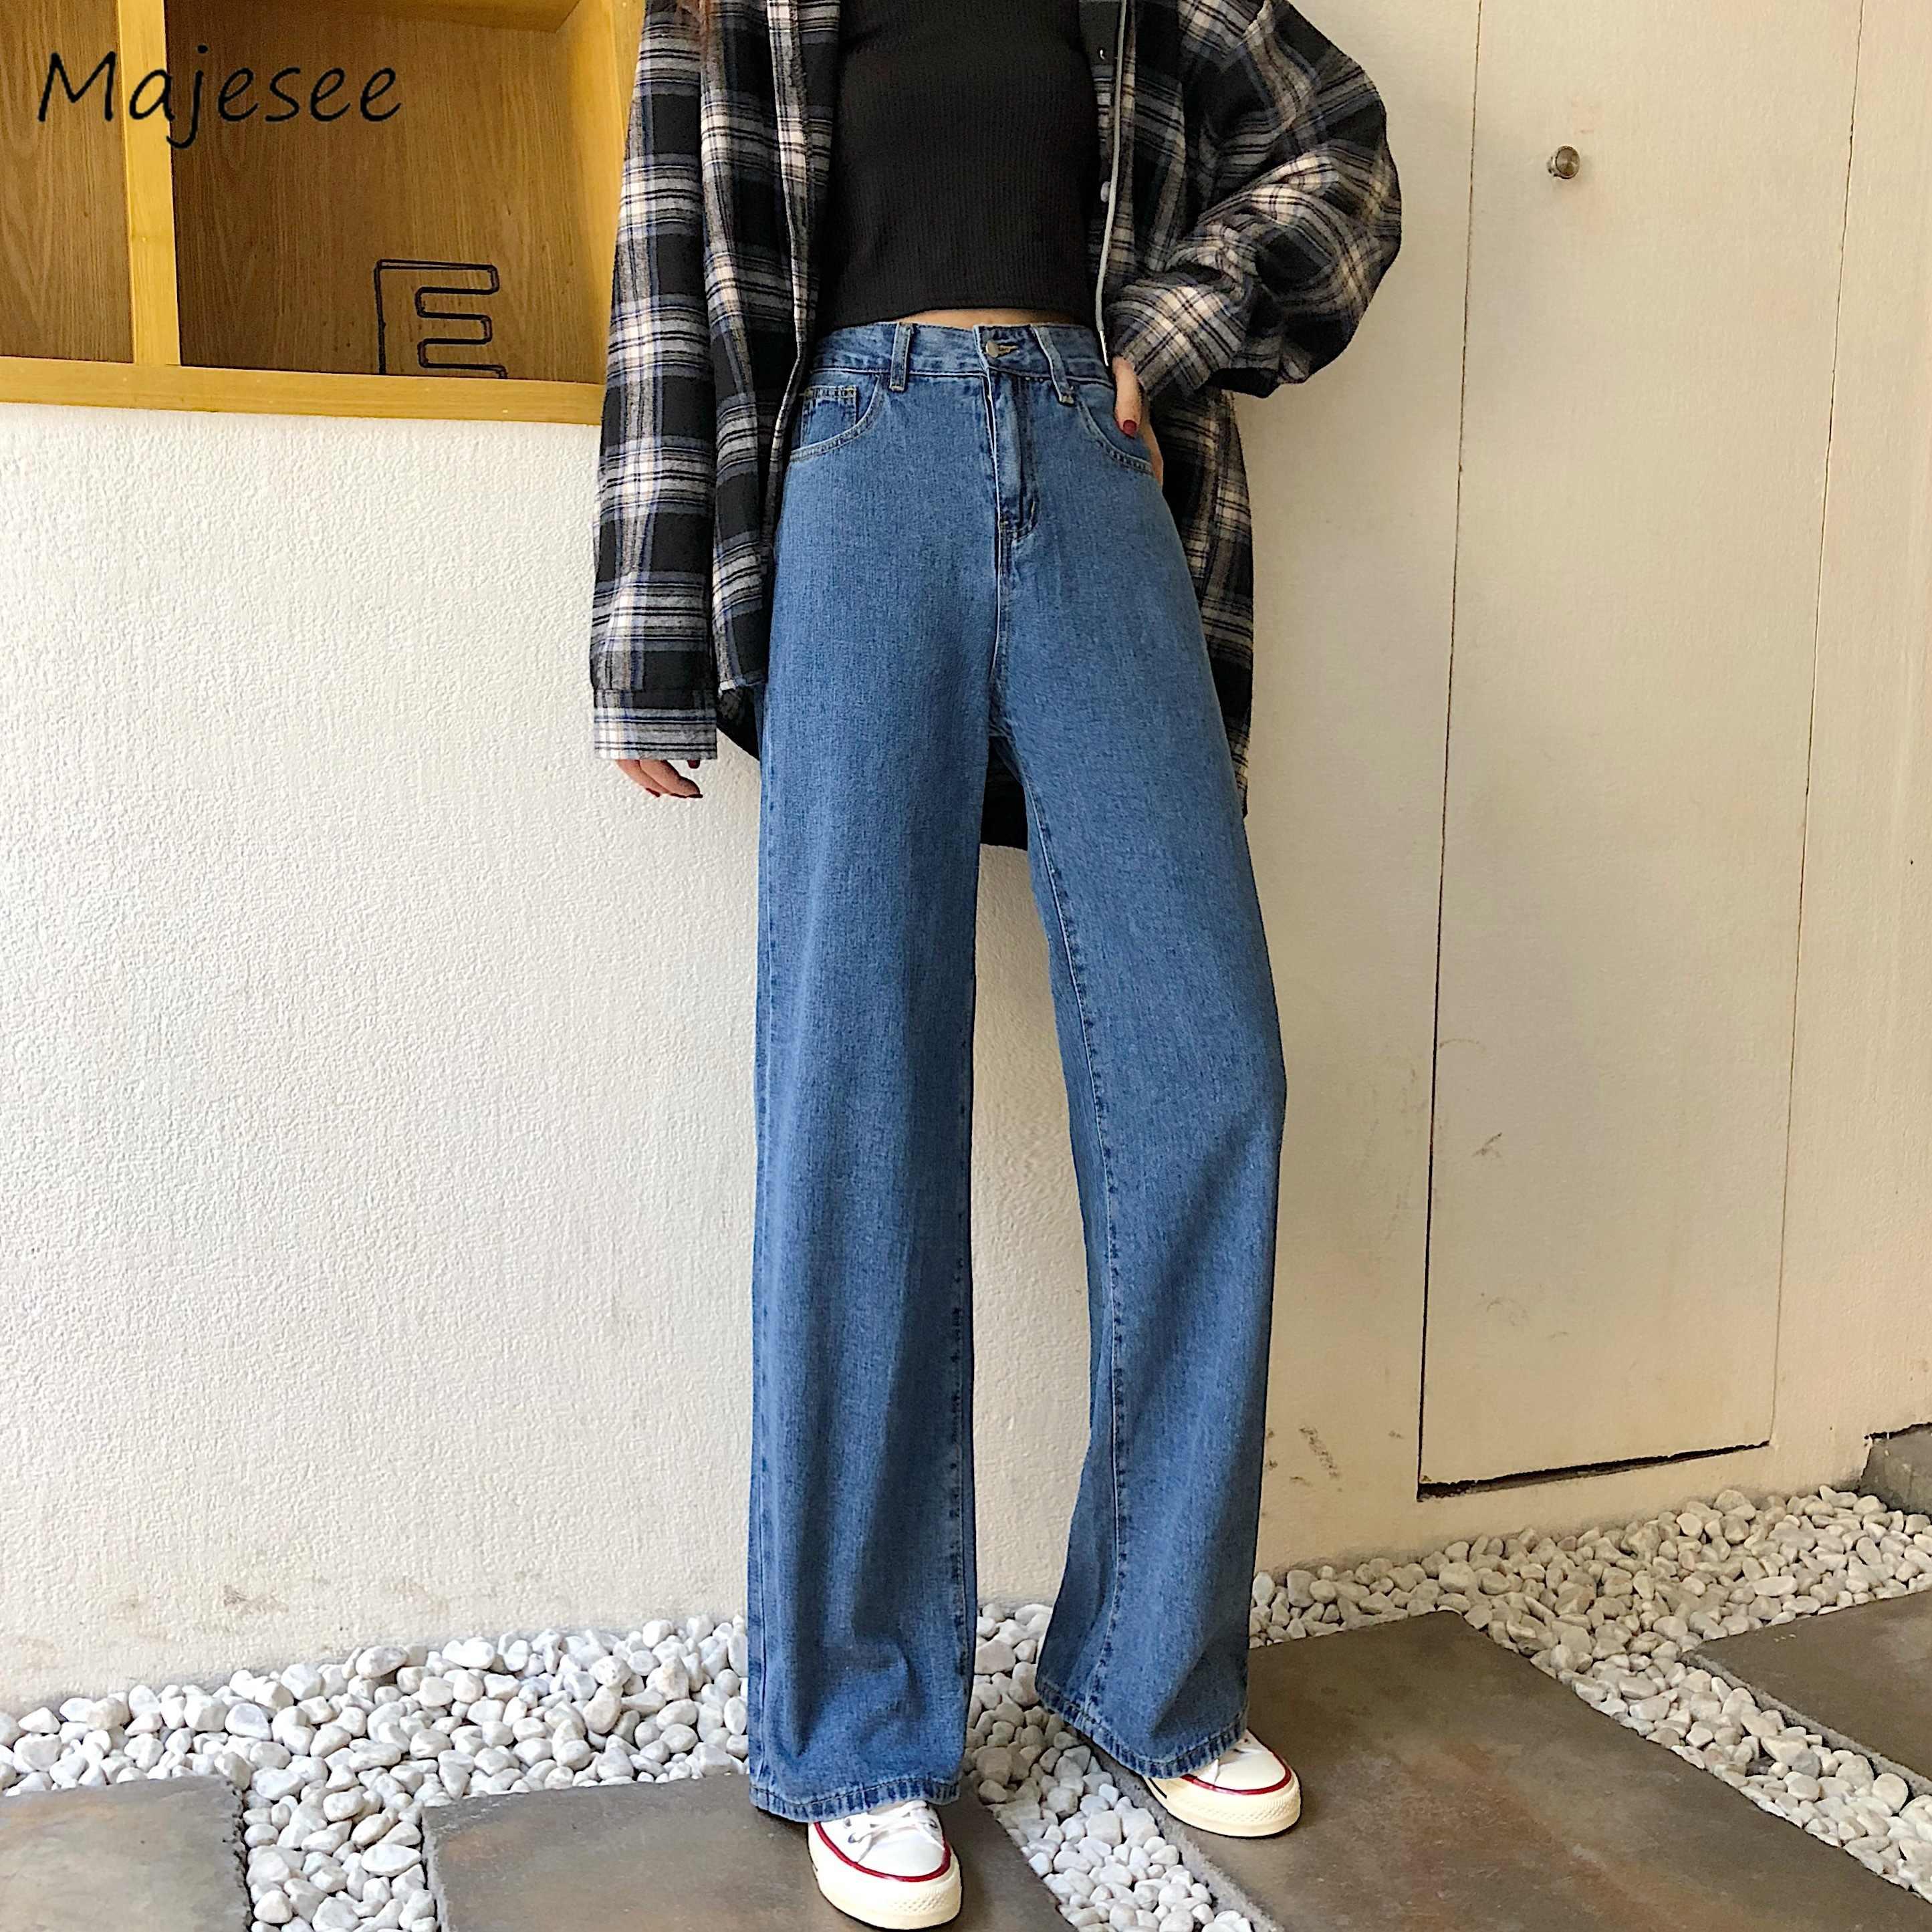 Pantalones Vaqueros Retro Clasicos Para Mujer Pantalon Harajuku De Pierna Larga Ancho Estilo Coreano Ulzzang Bf Moda Informal Elegante Que Combina Con Todo Pantalones Vaqueros Aliexpress